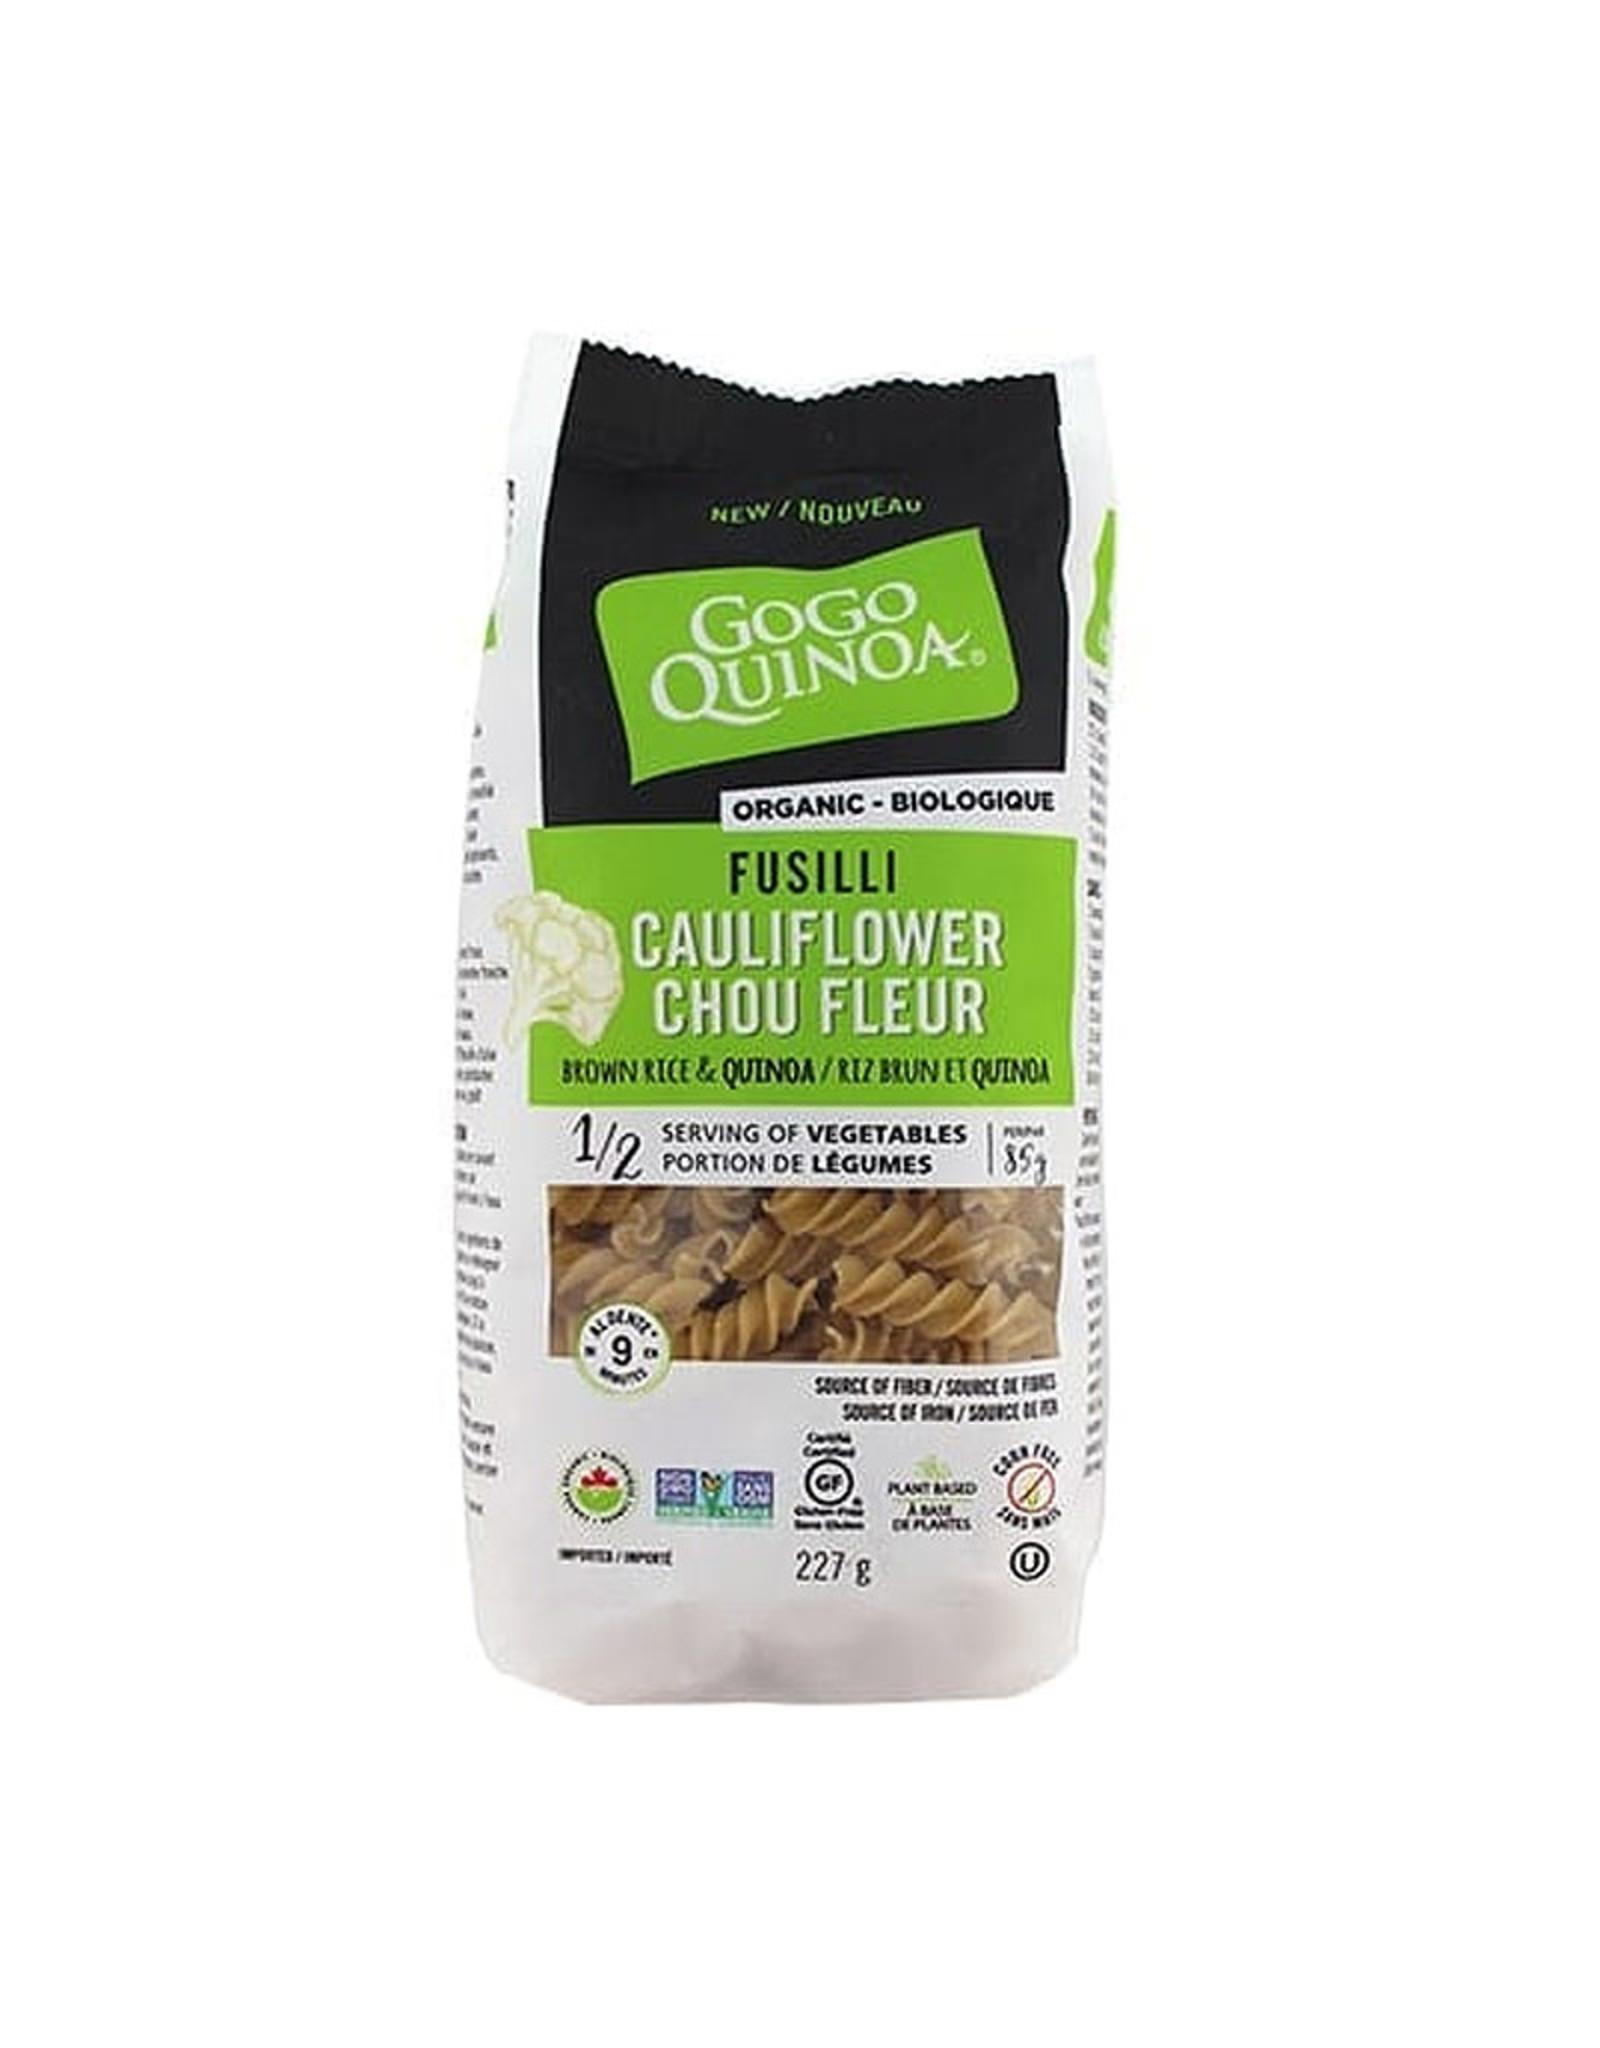 Gogo Quinoa GOGO Quinoa - Pasta, Organic Cauliflower Fusilli (227g)